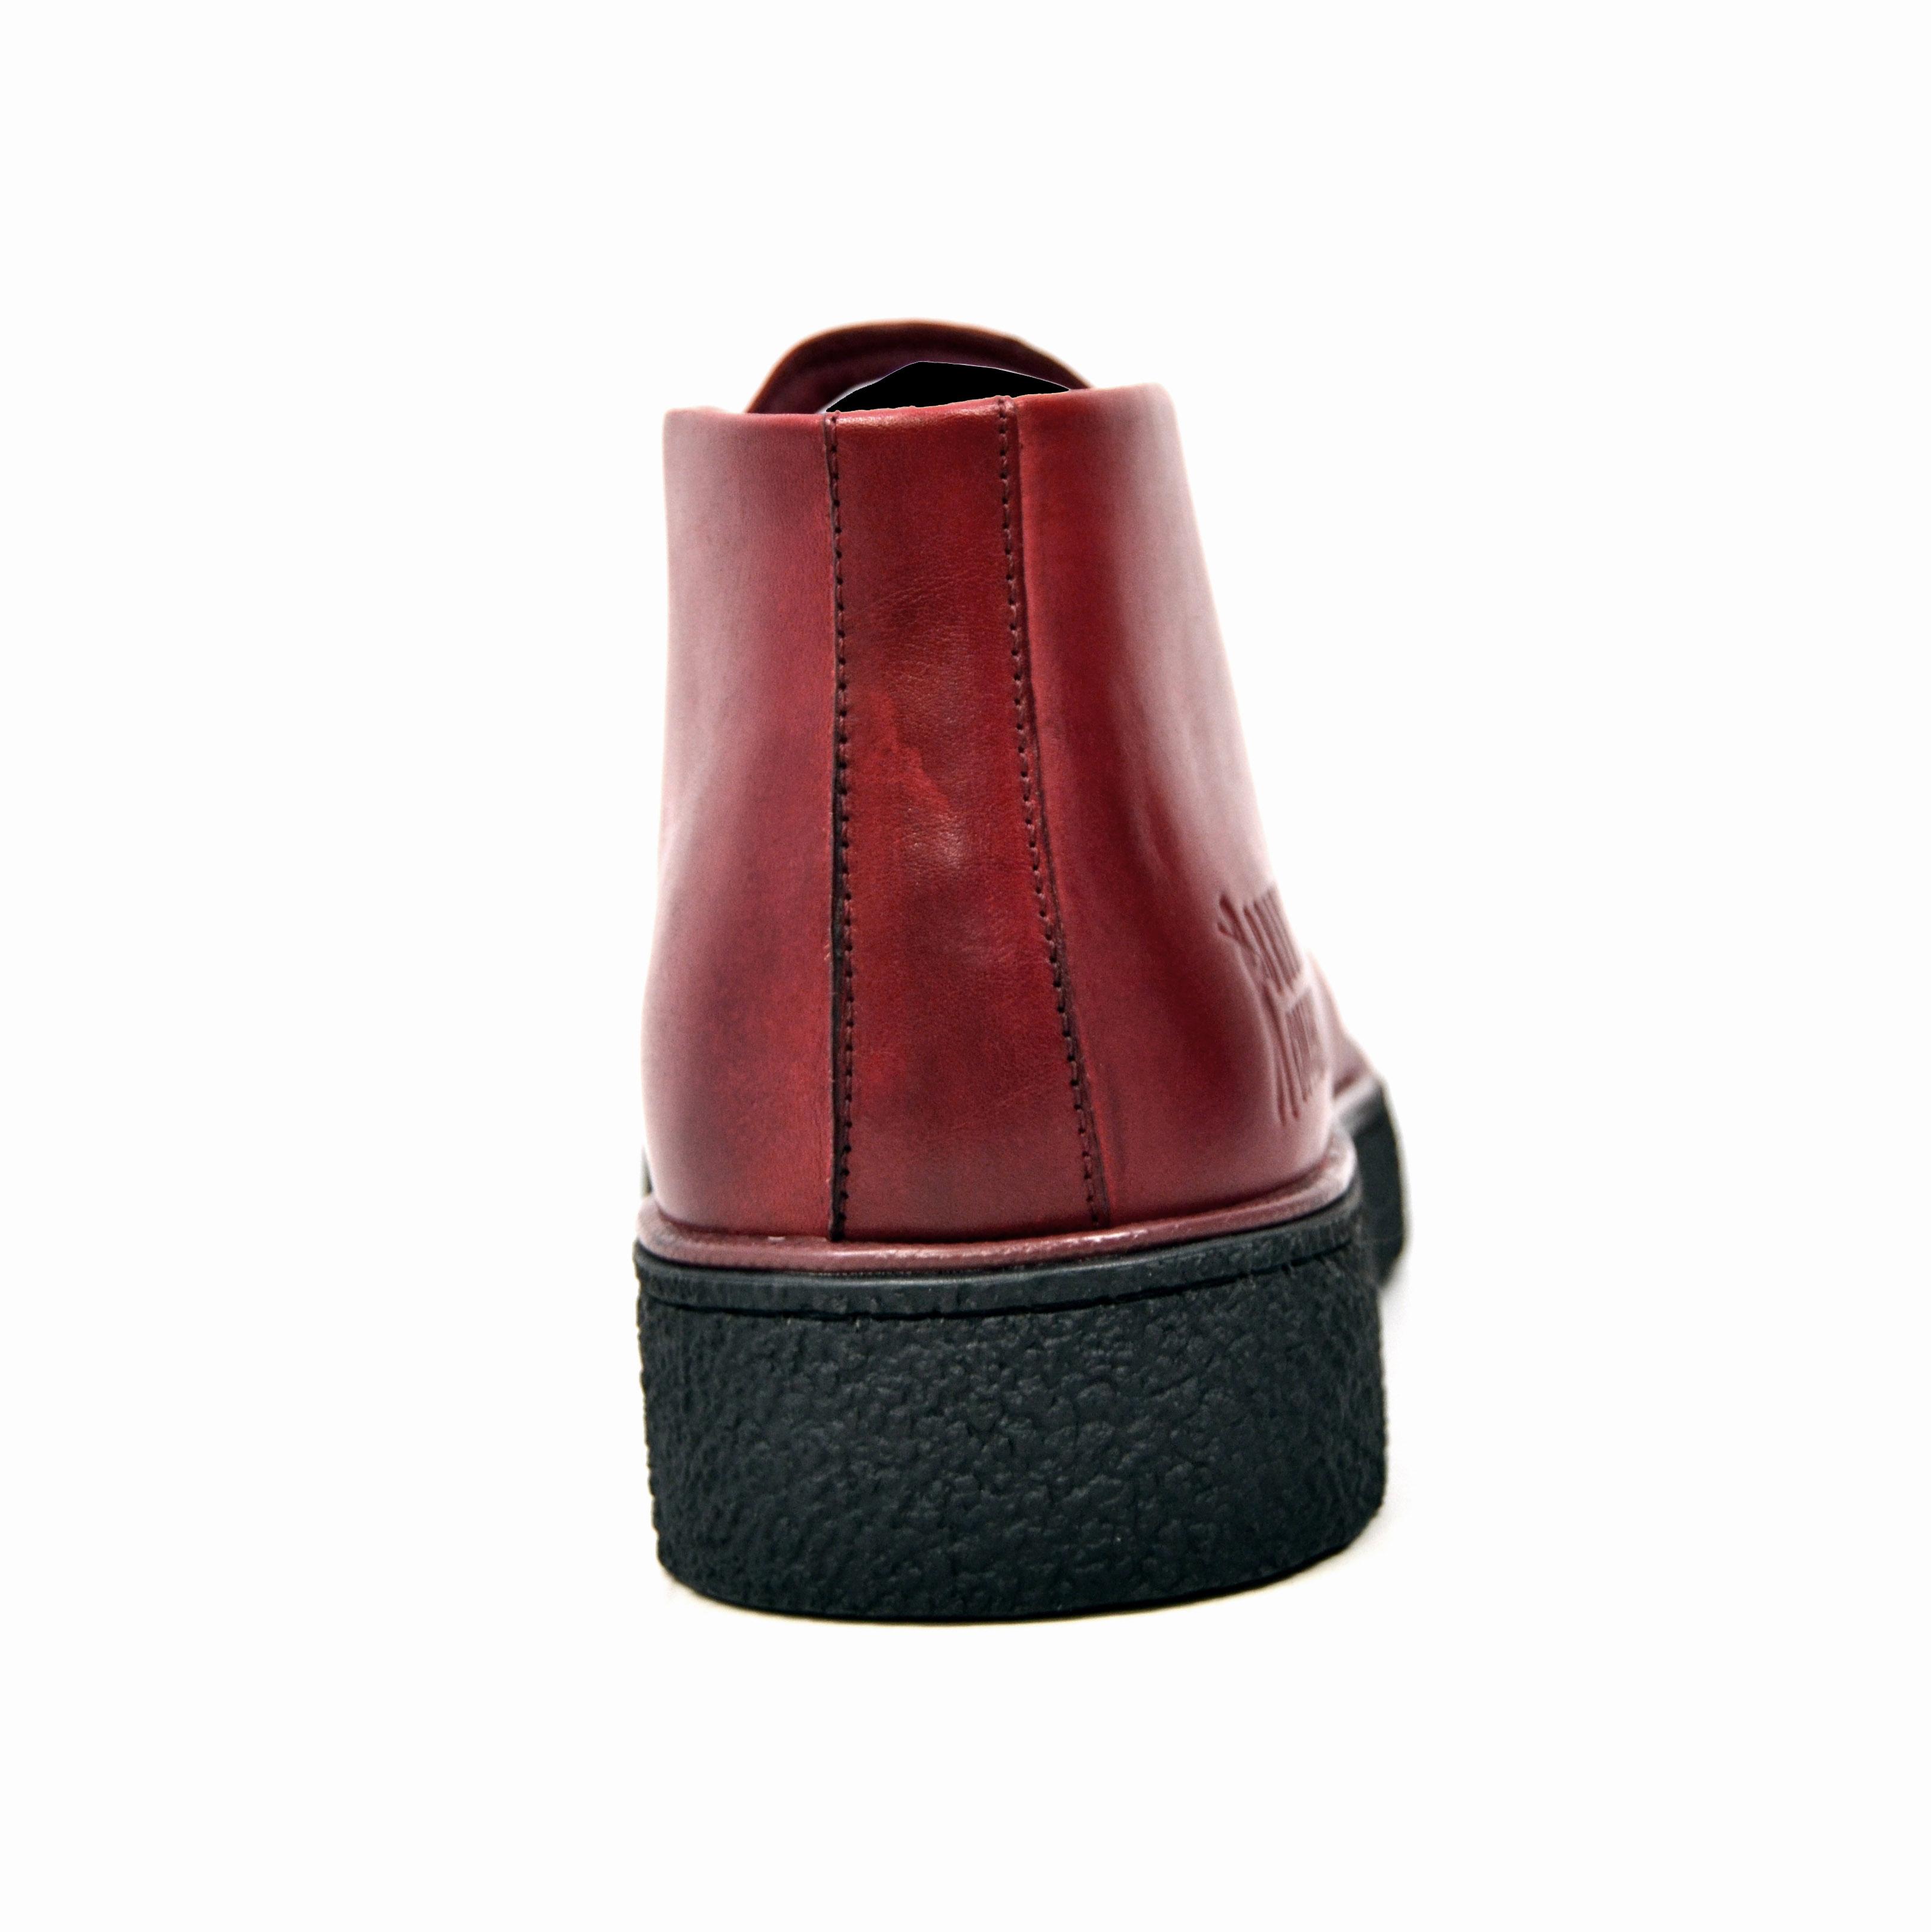 88e66e7c49 Classic Playboy Chukka Boot Wine Leather  1226-7  -  99.99   British ...